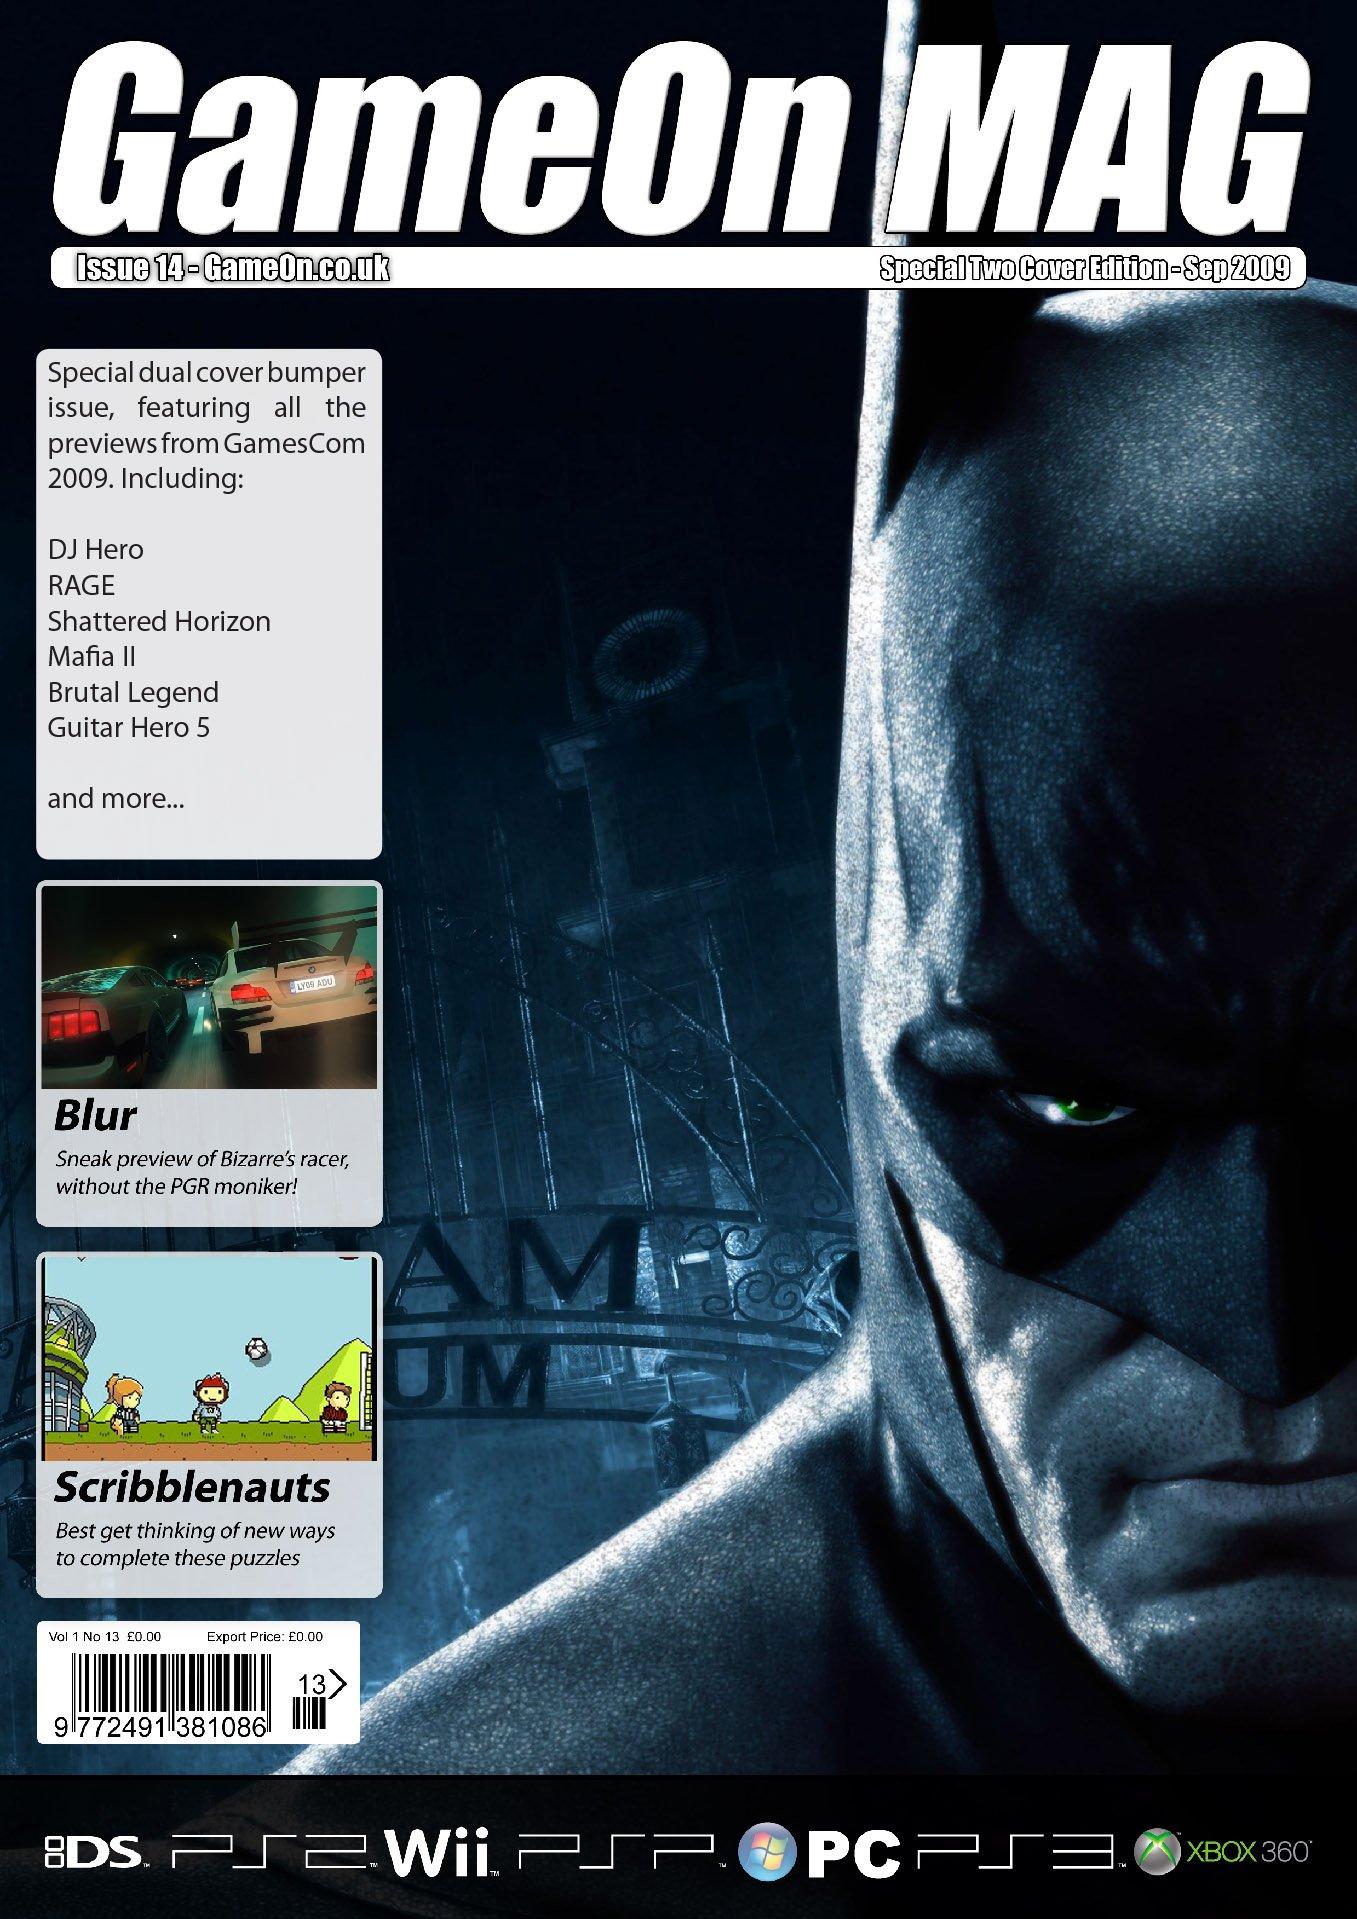 GameOn 014 (September 2009) (cover 1)